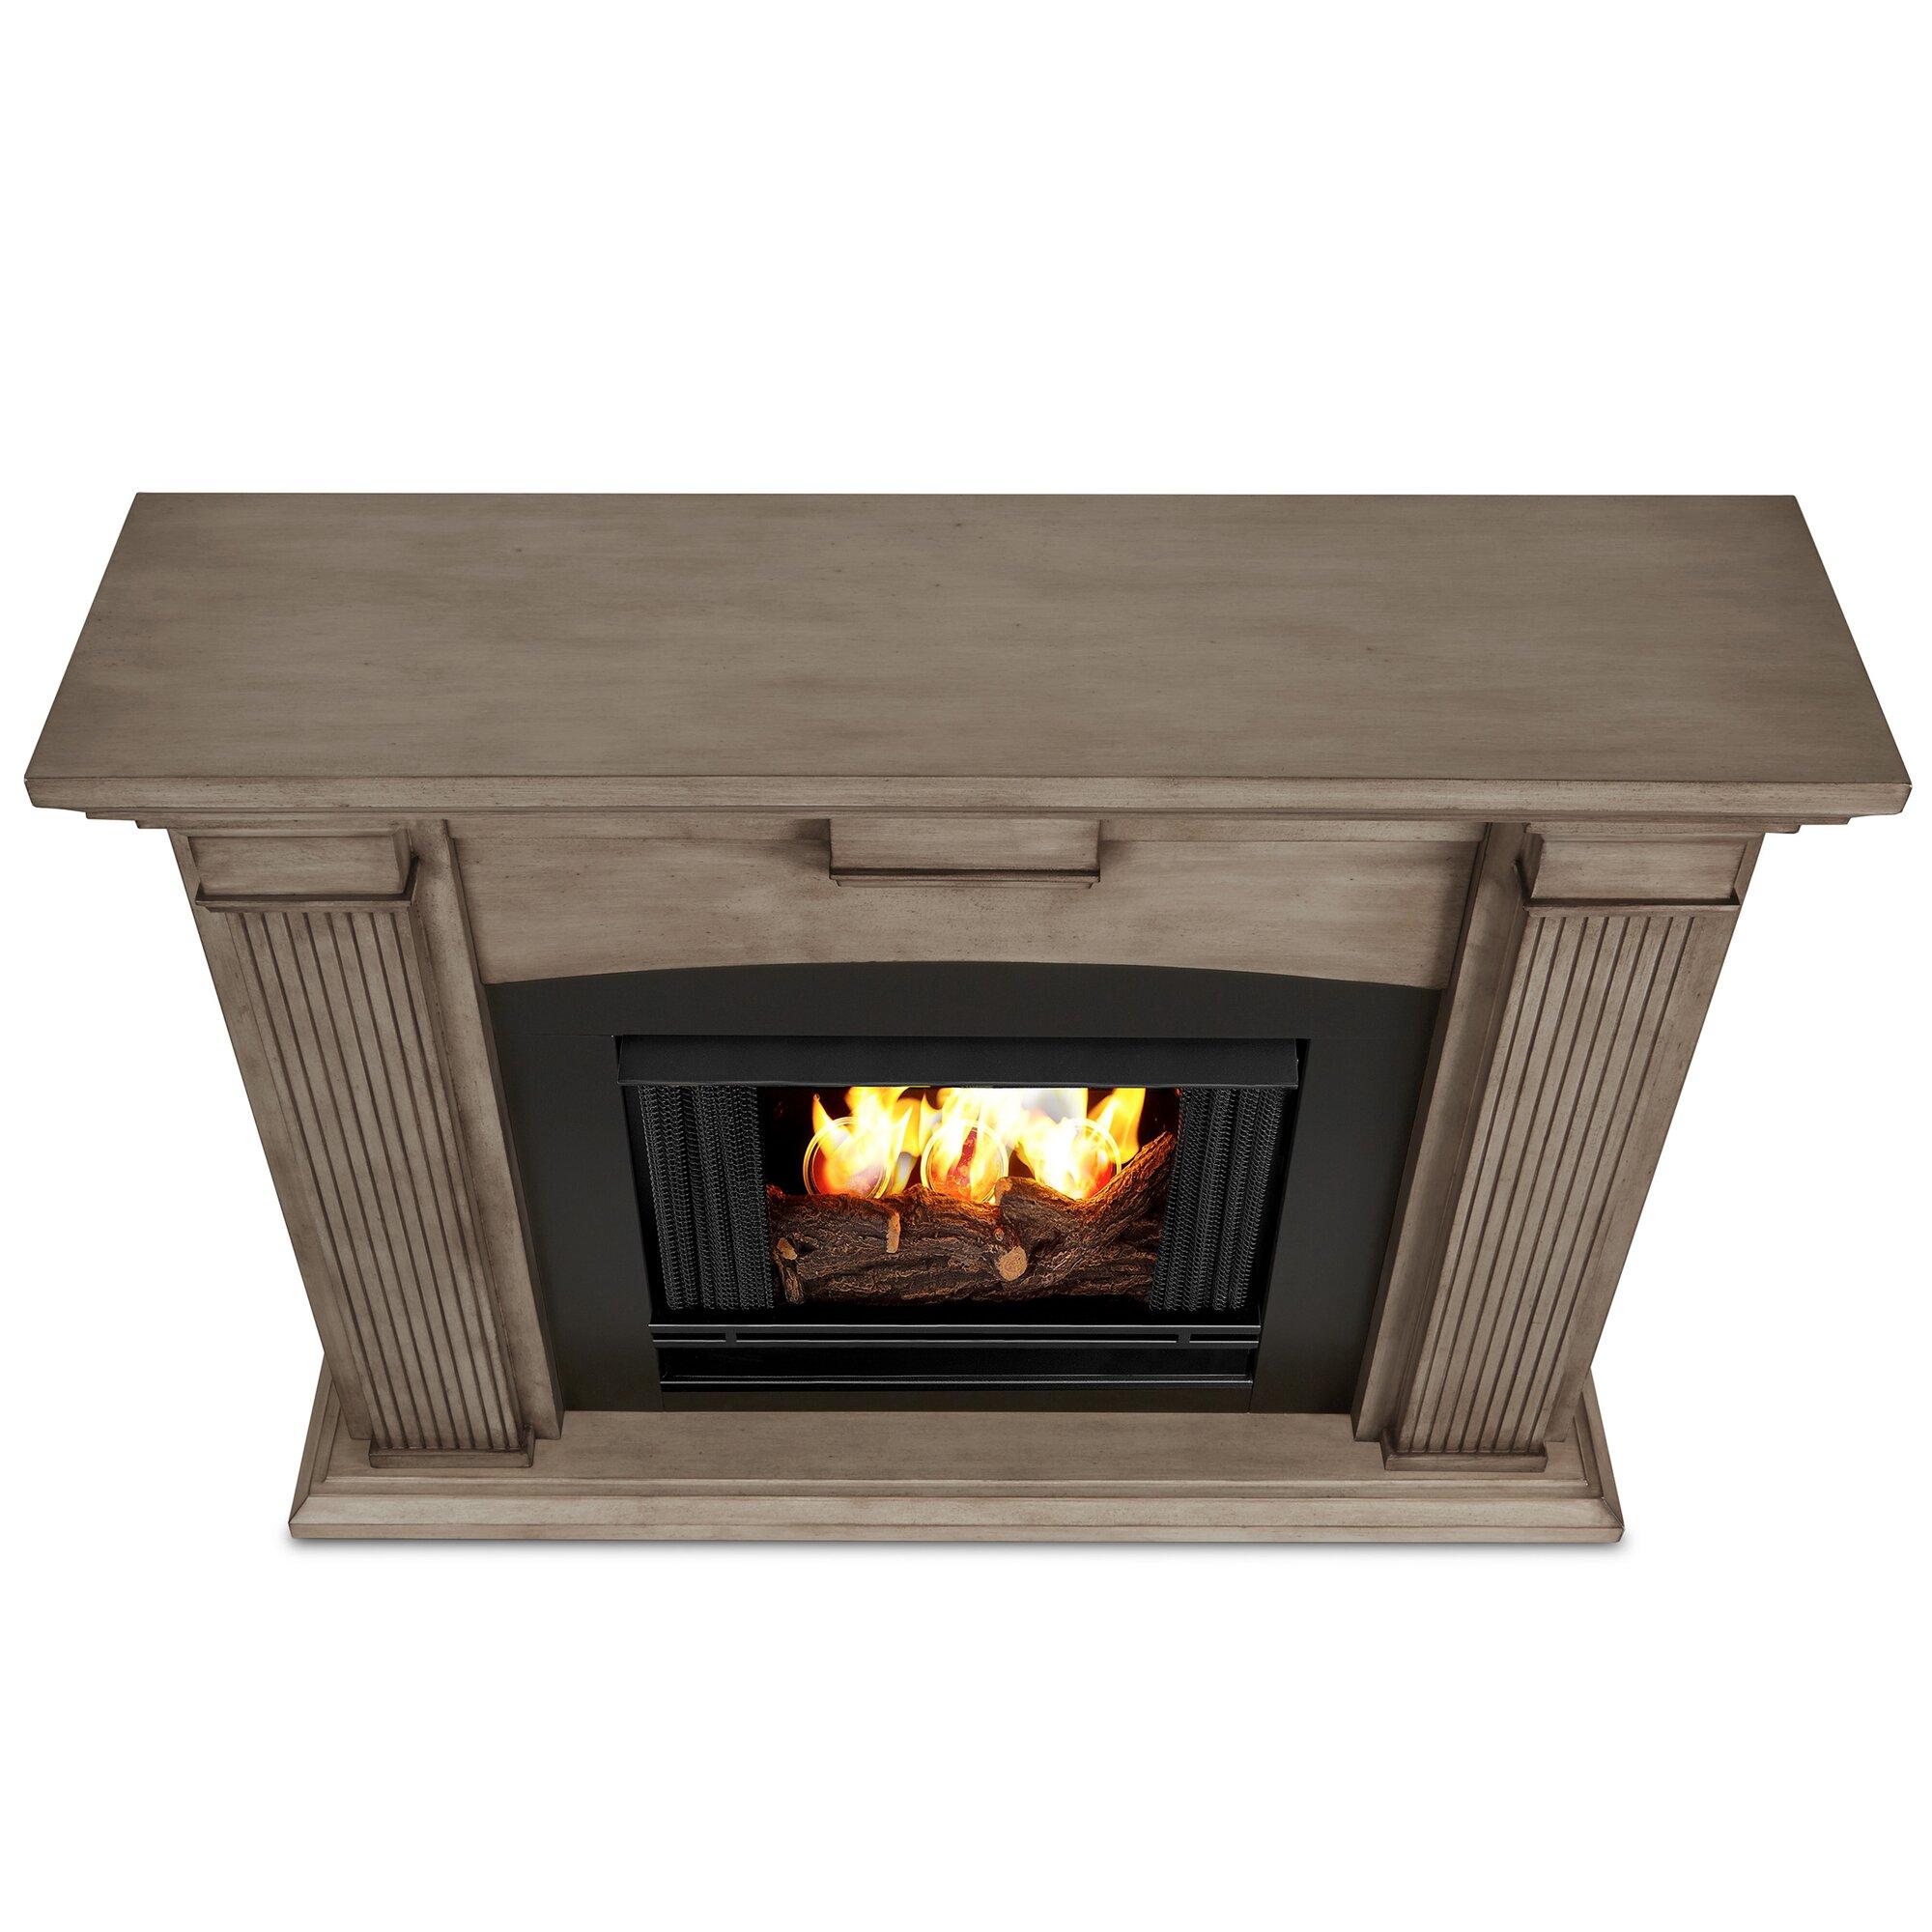 Real Flame Adelaide Gel Fuel Fireplace Amp Reviews Wayfair